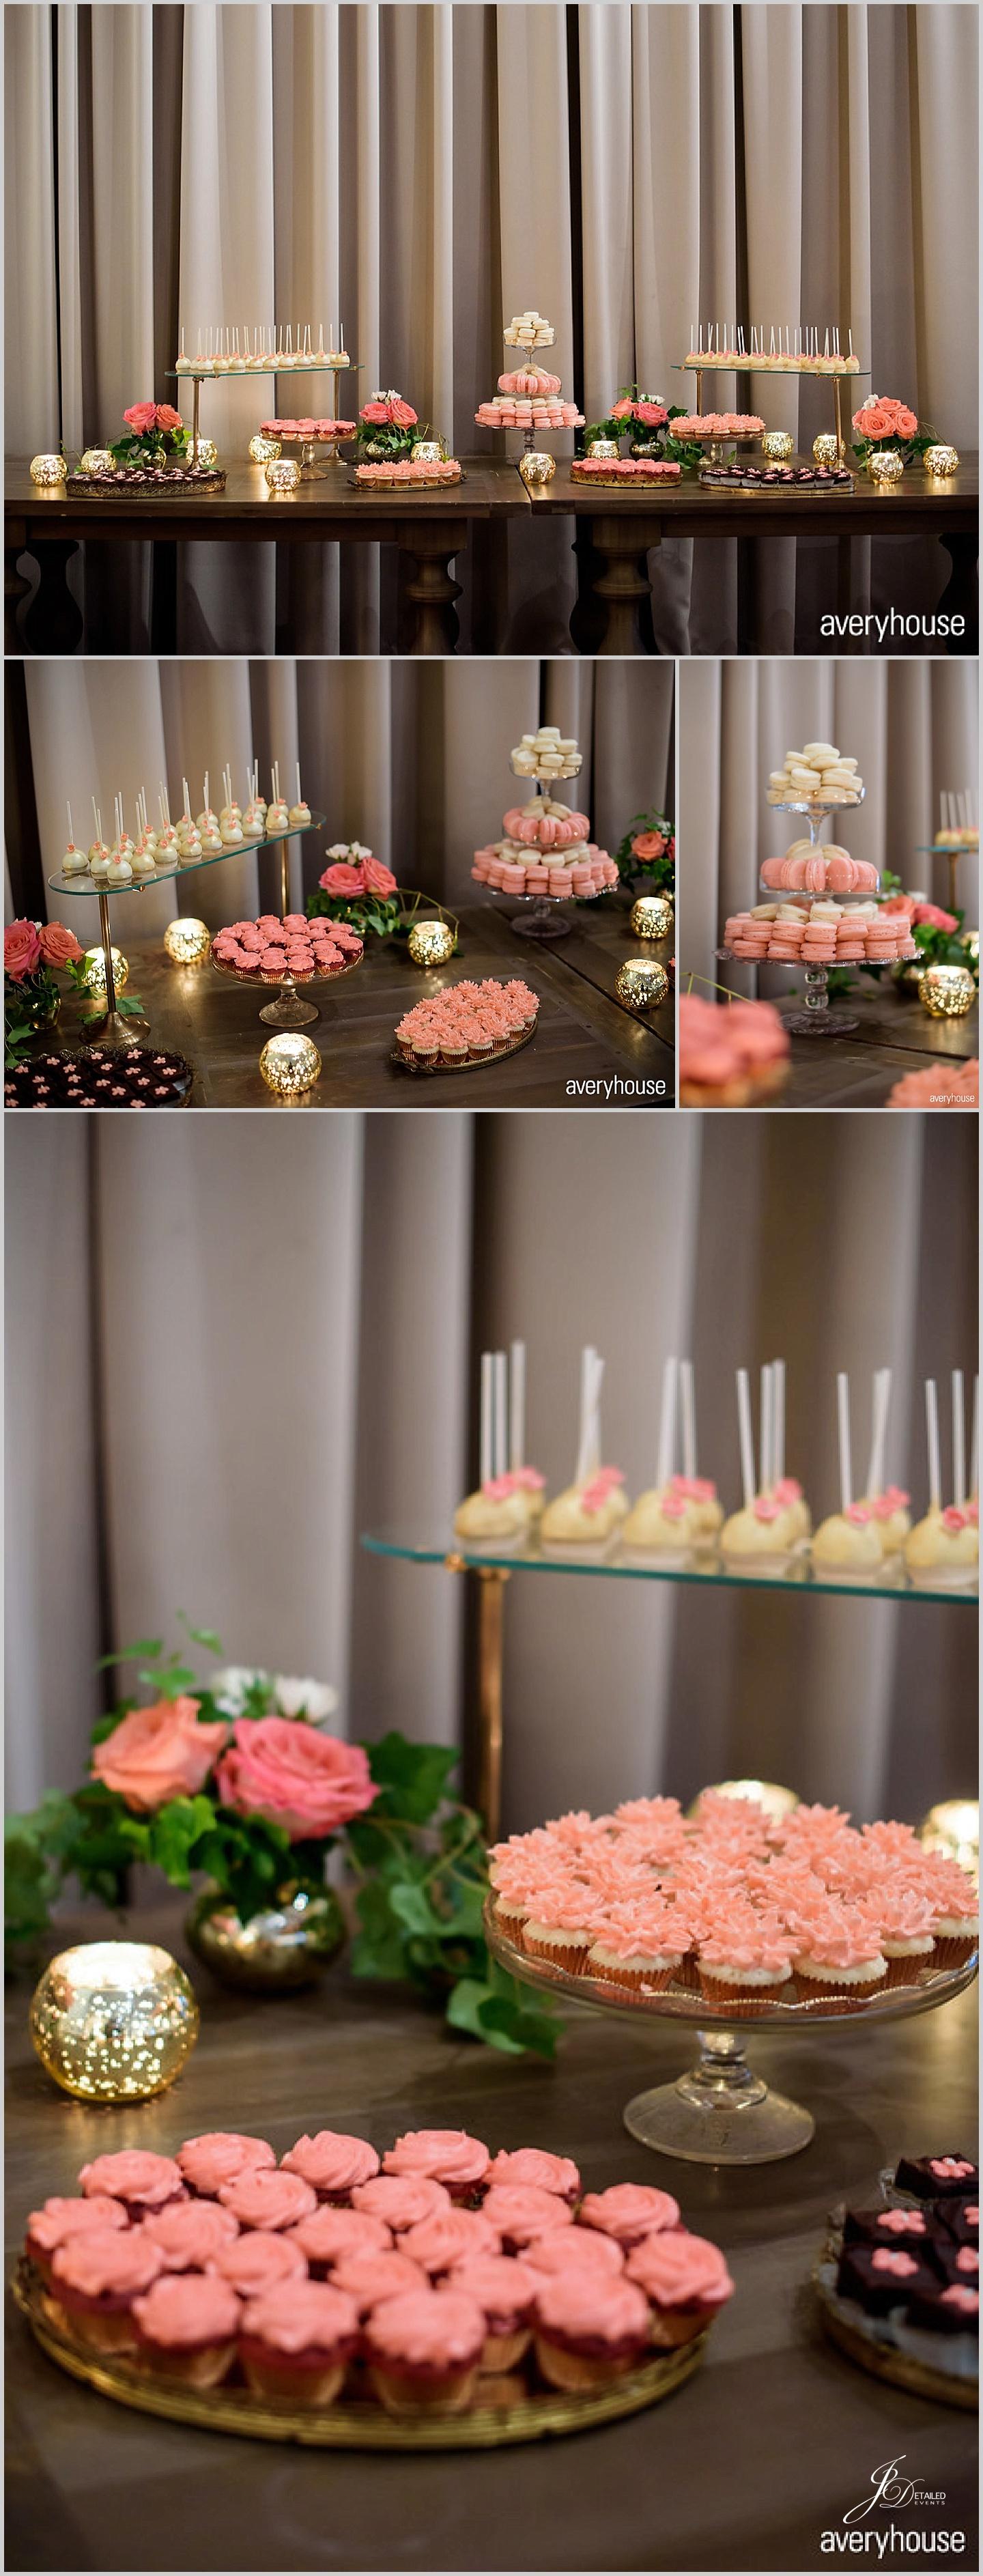 avery-house-wedding-chicago_2222